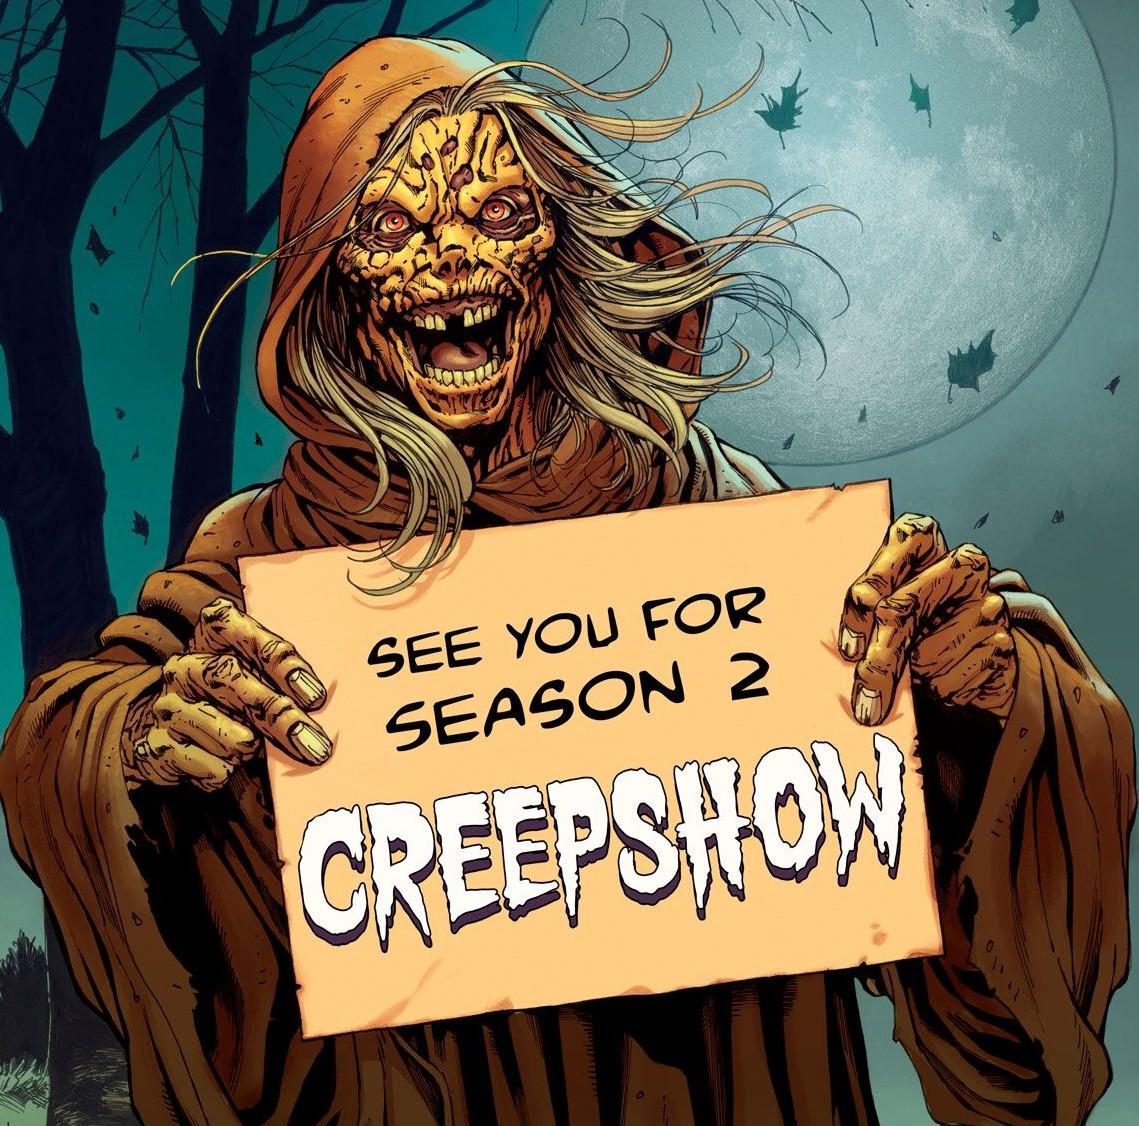 [News] Shudder Renews Second Season of CREEPSHOW